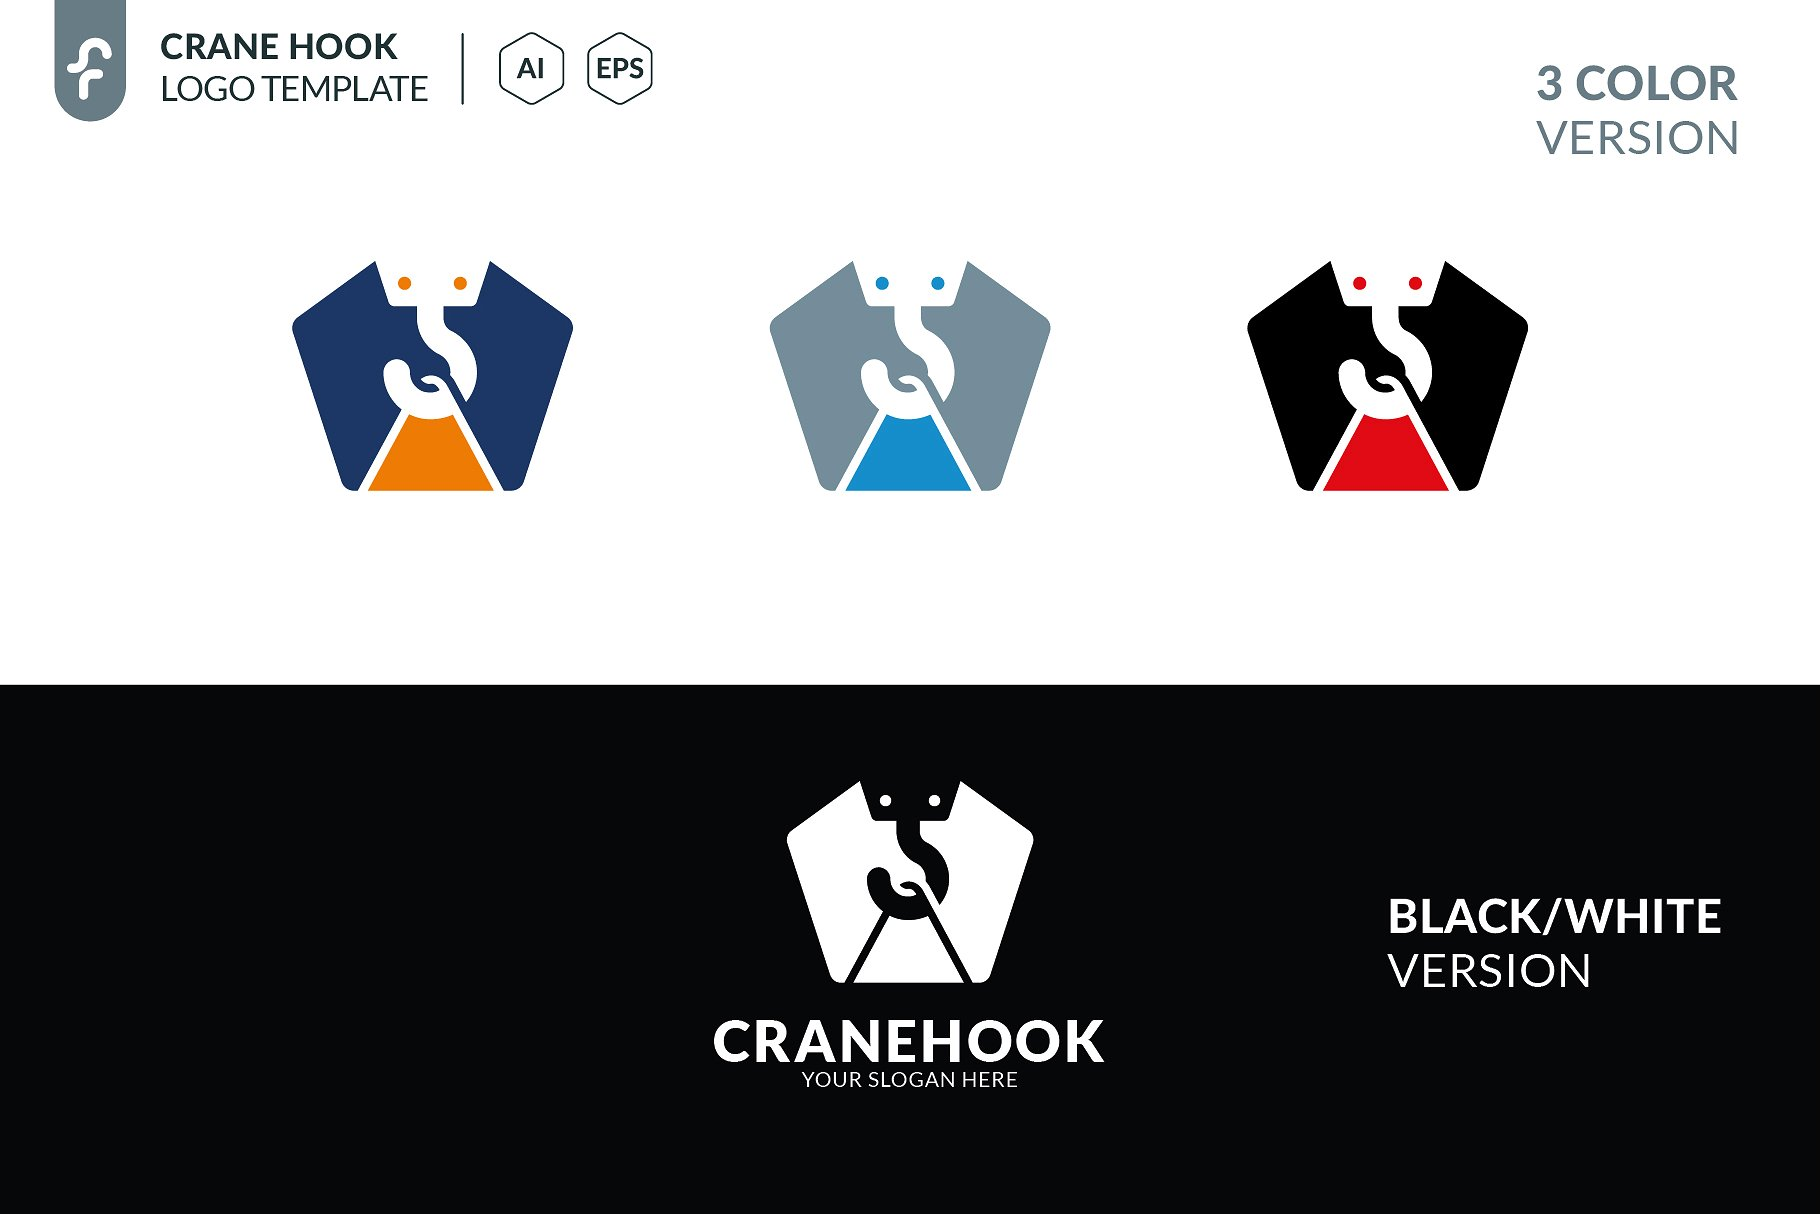 crane-hook-logo-03-